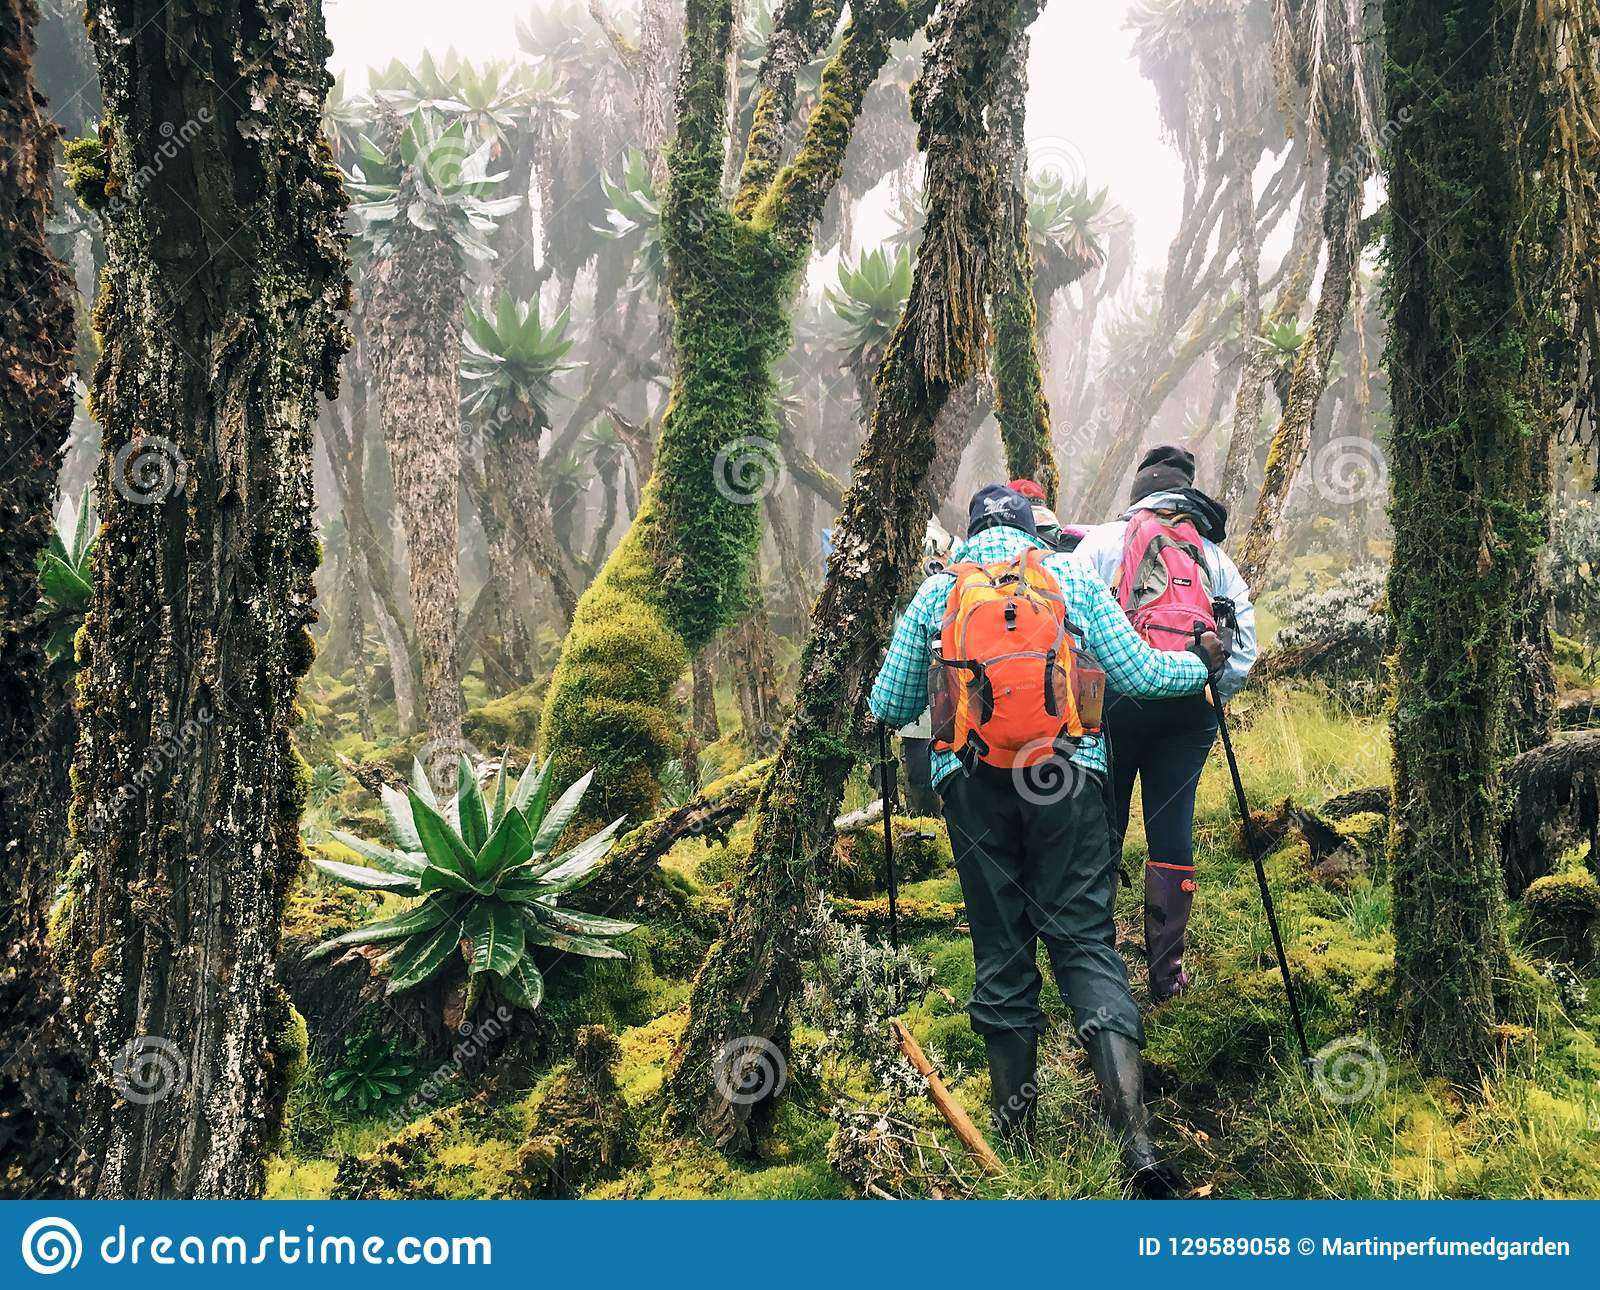 Hikers in the Rwenzori Mountains, Uganda